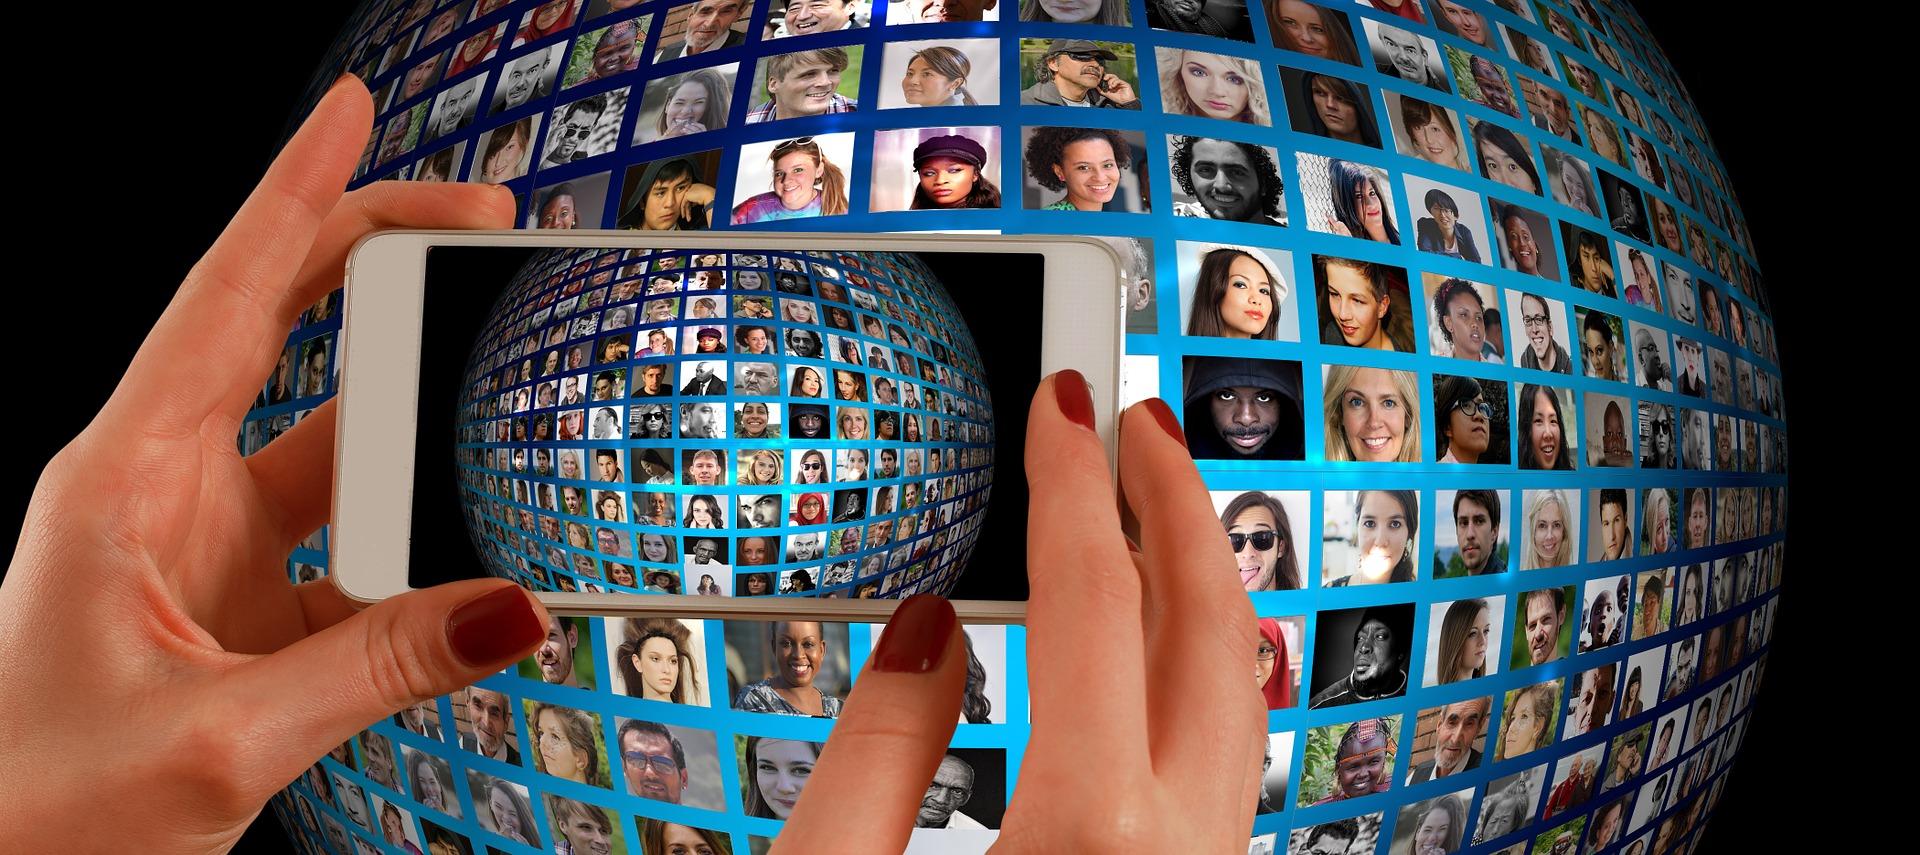 smartphone-1445489_1920.jpg